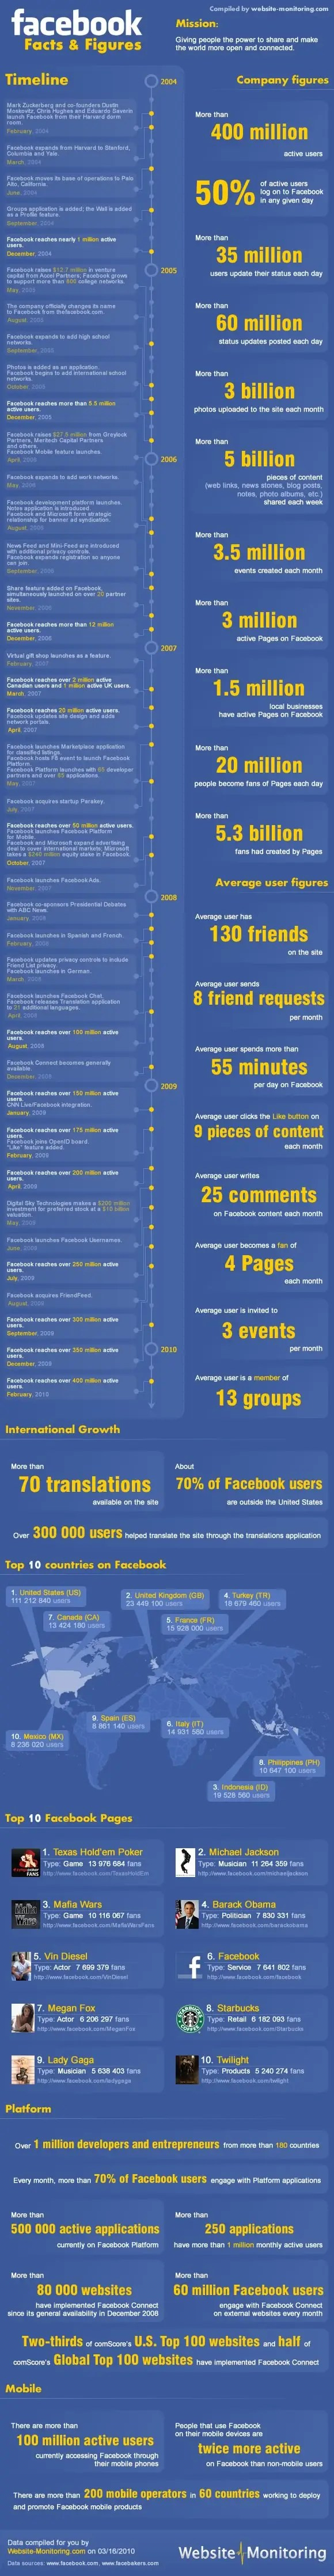 Facebook Fact Sheet